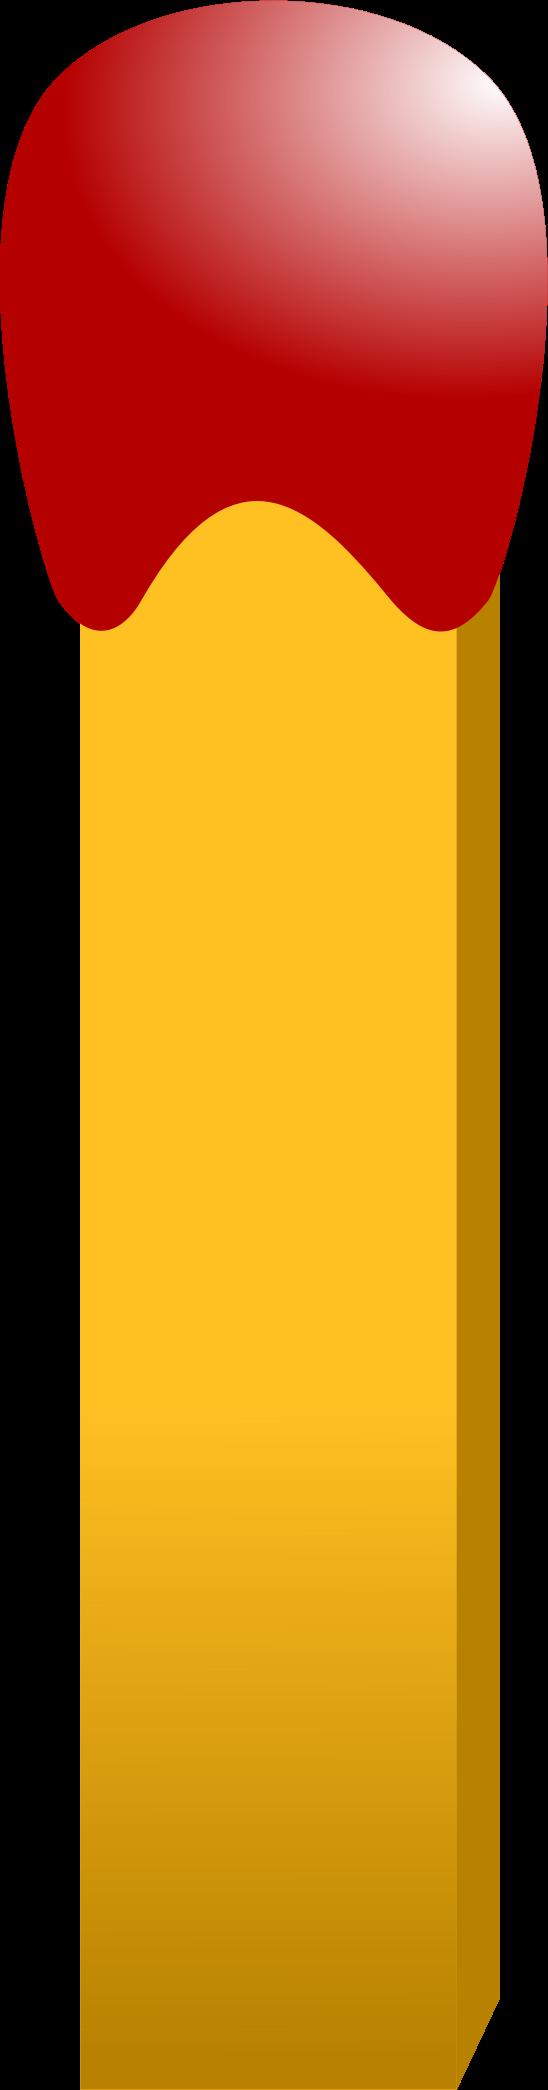 Clipart Fosforo